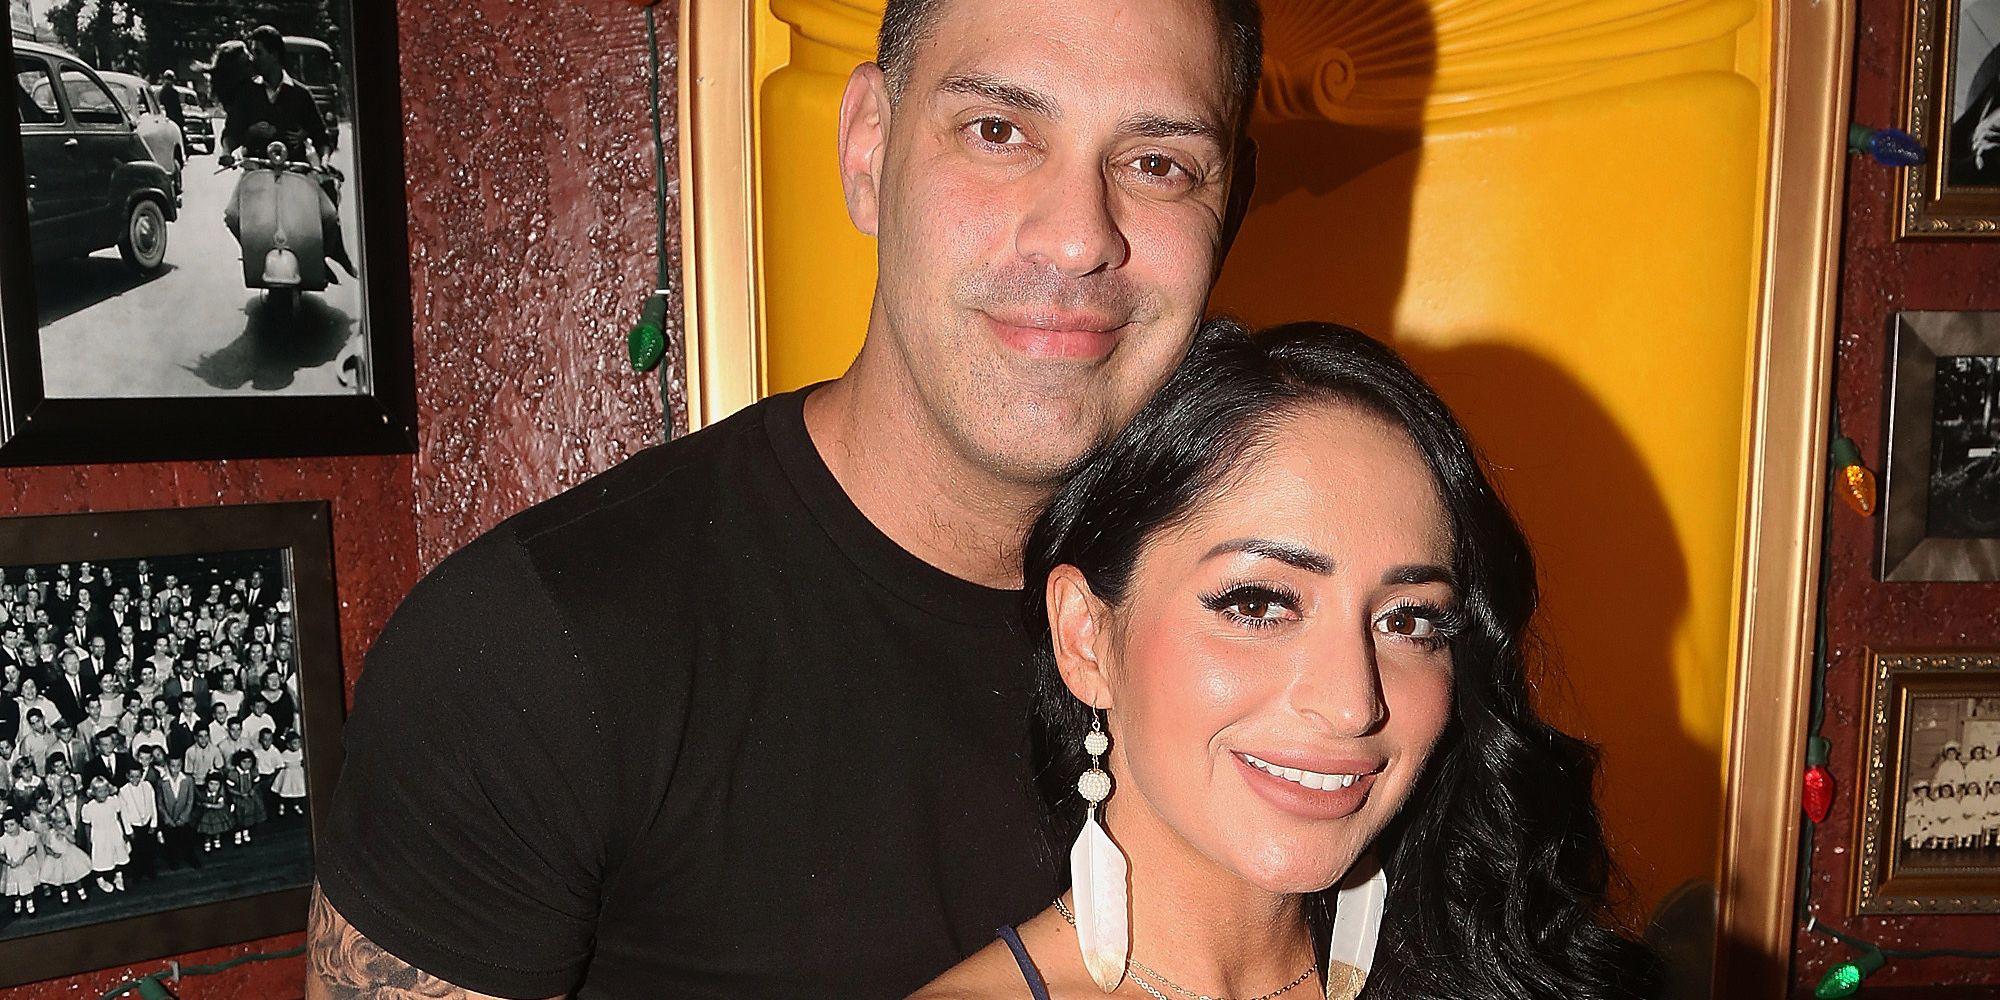 Jersey Shore: Angelina & Husband Unfollow Each Other, Spark Divorce Rumors